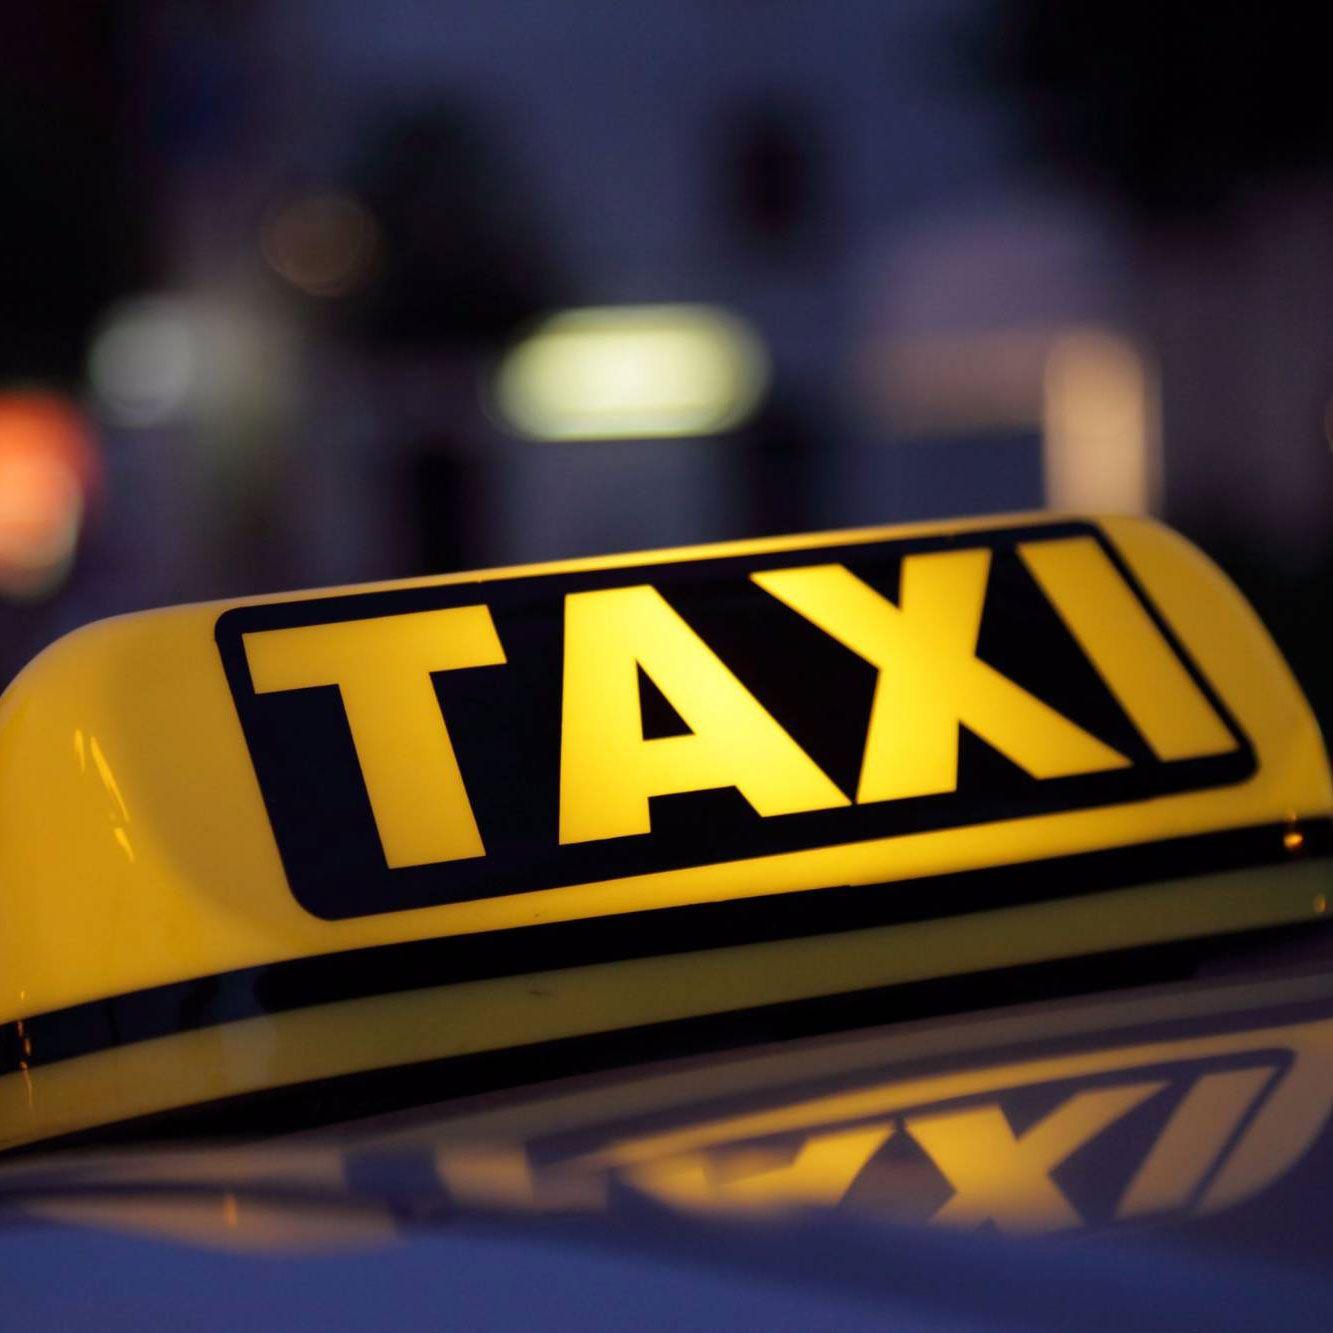 Taxi i Karlskrona